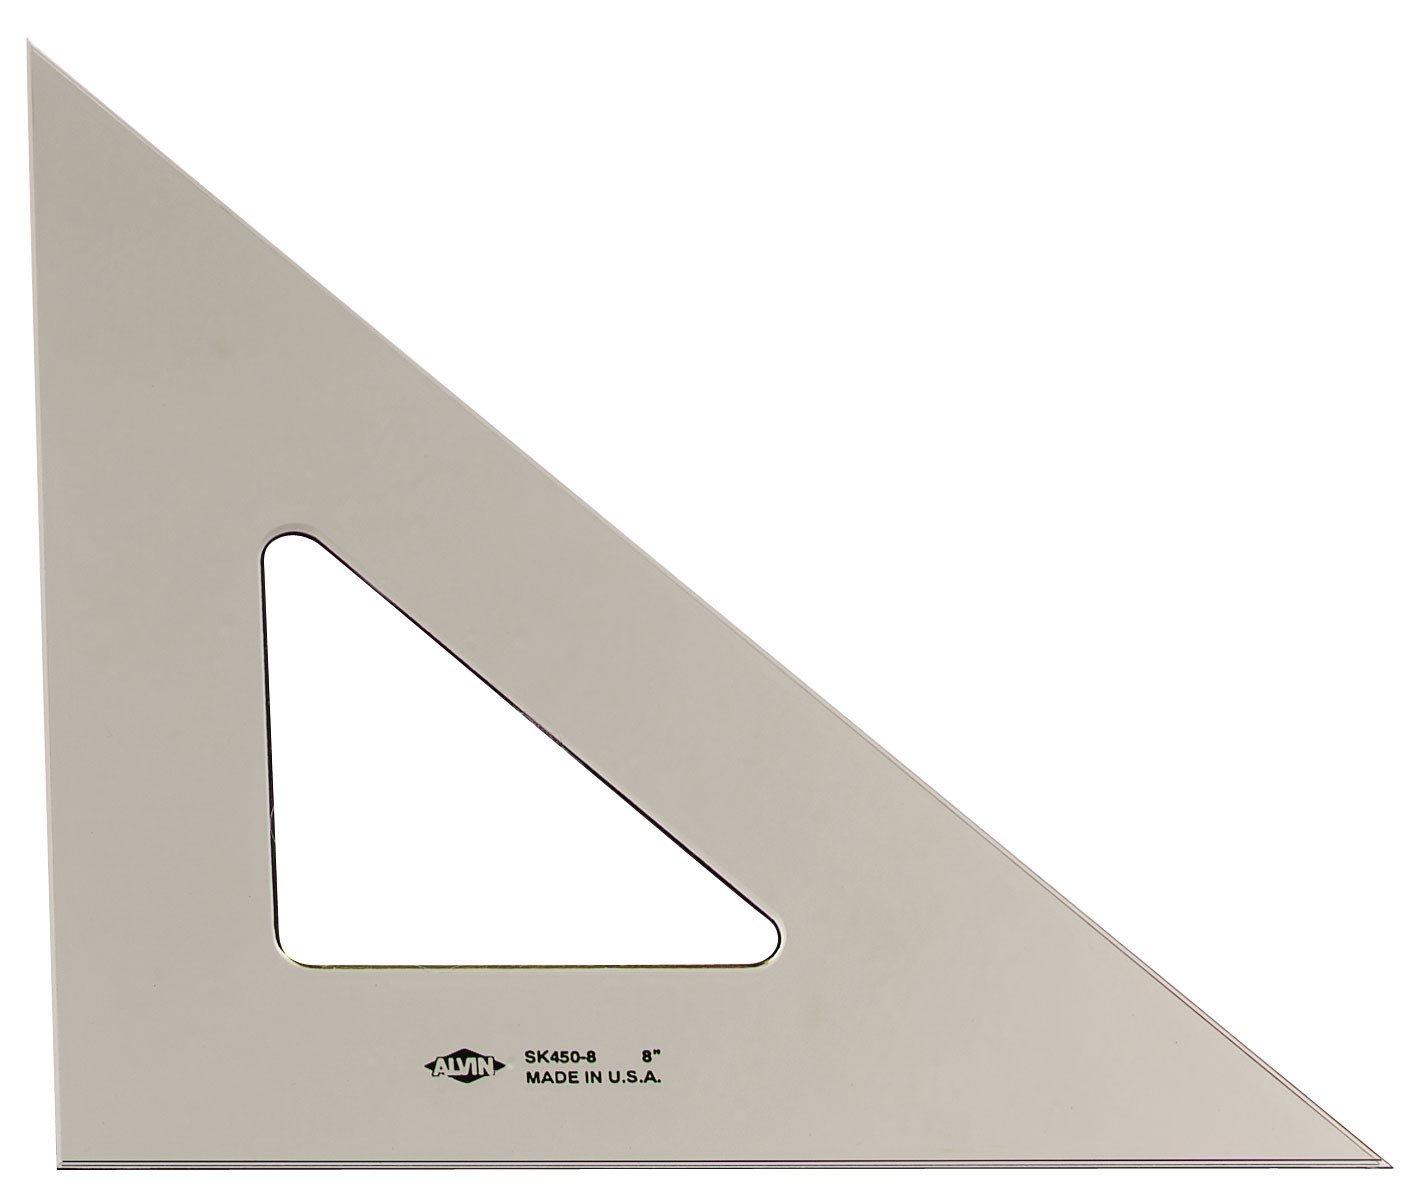 "Amazon.com : Alvin SK450-8 8"" Smoke-Tint Triangle 45 Degree/90 Degree, : Alvin Triangle : Office Products"